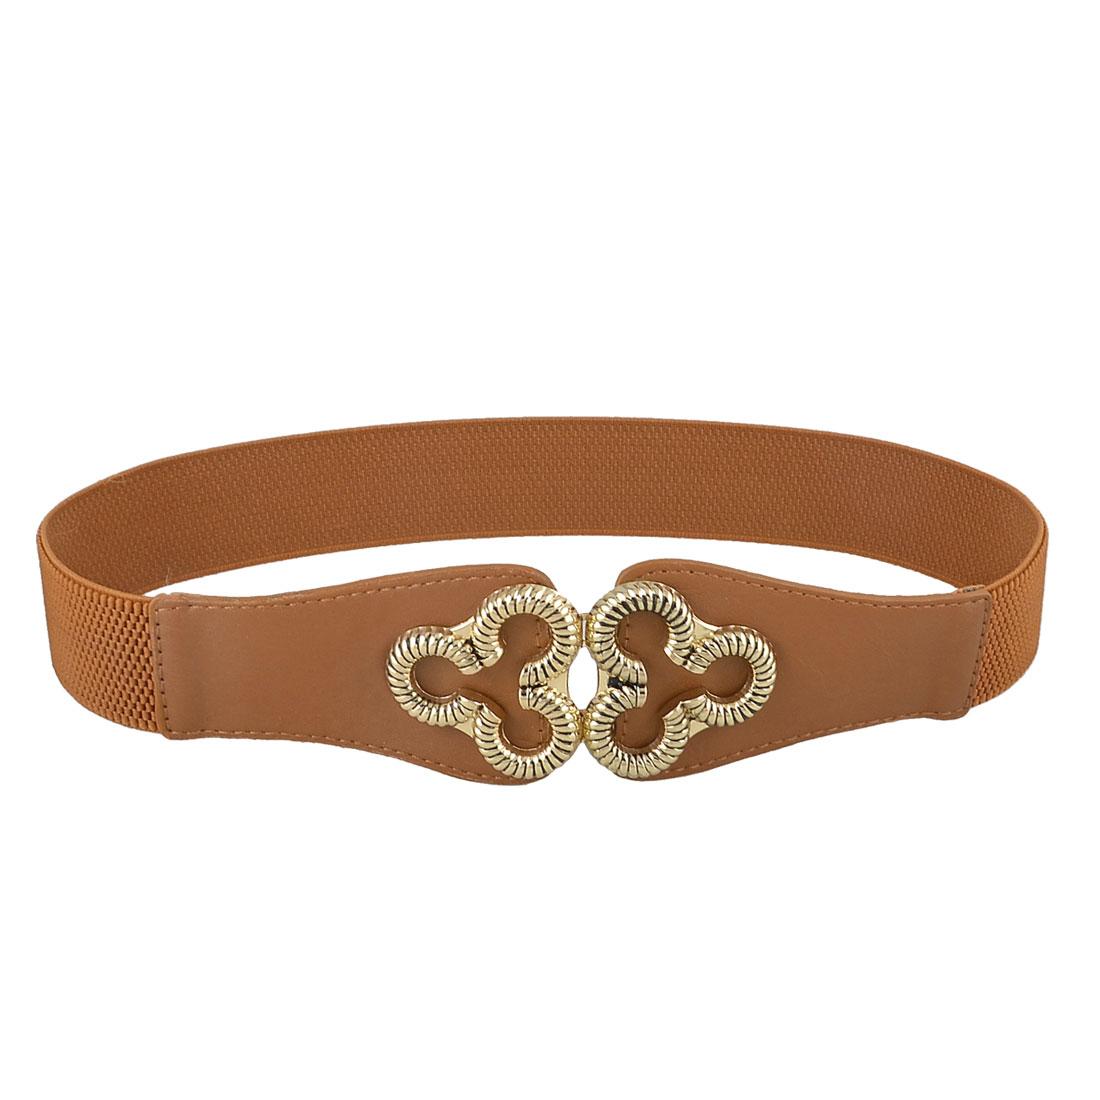 Floral Metal Interlock Buckle 3.5cm Wide Elastic Cinch Blouse Corset Band Belt Brown